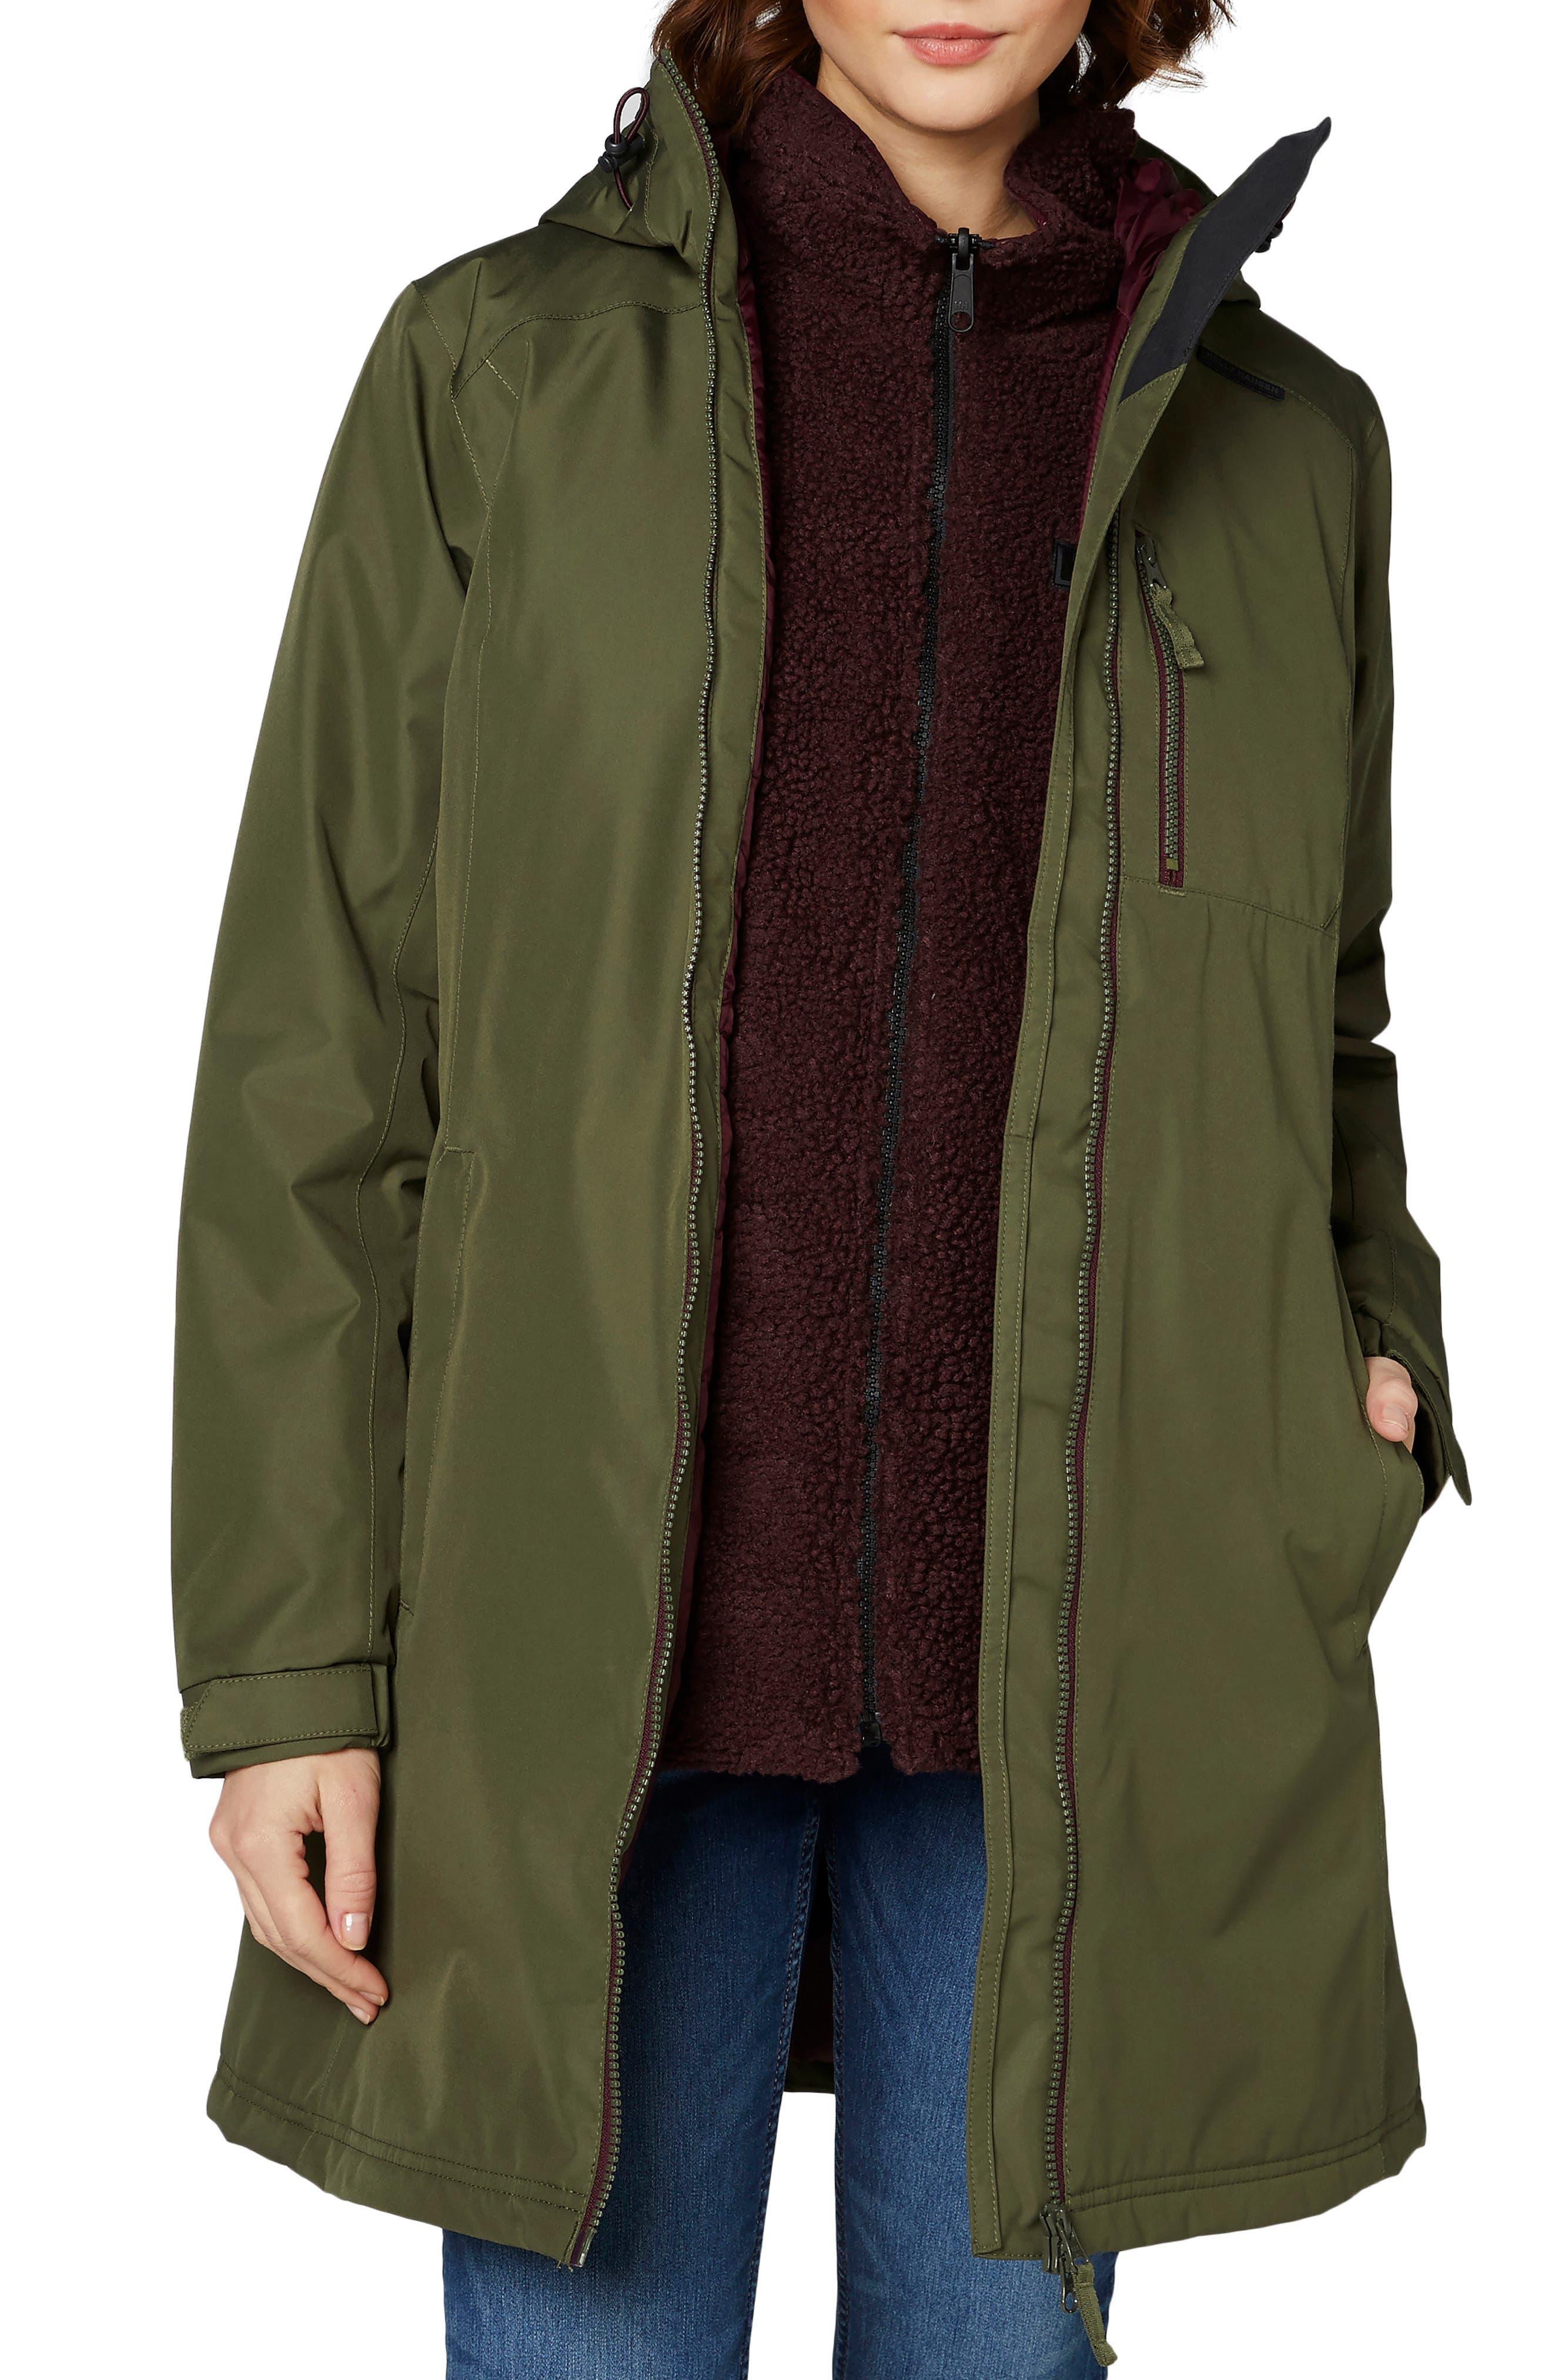 HELLY HANSEN,                             'Belfast' Long Waterproof Winter Rain Jacket,                             Main thumbnail 1, color,                             391